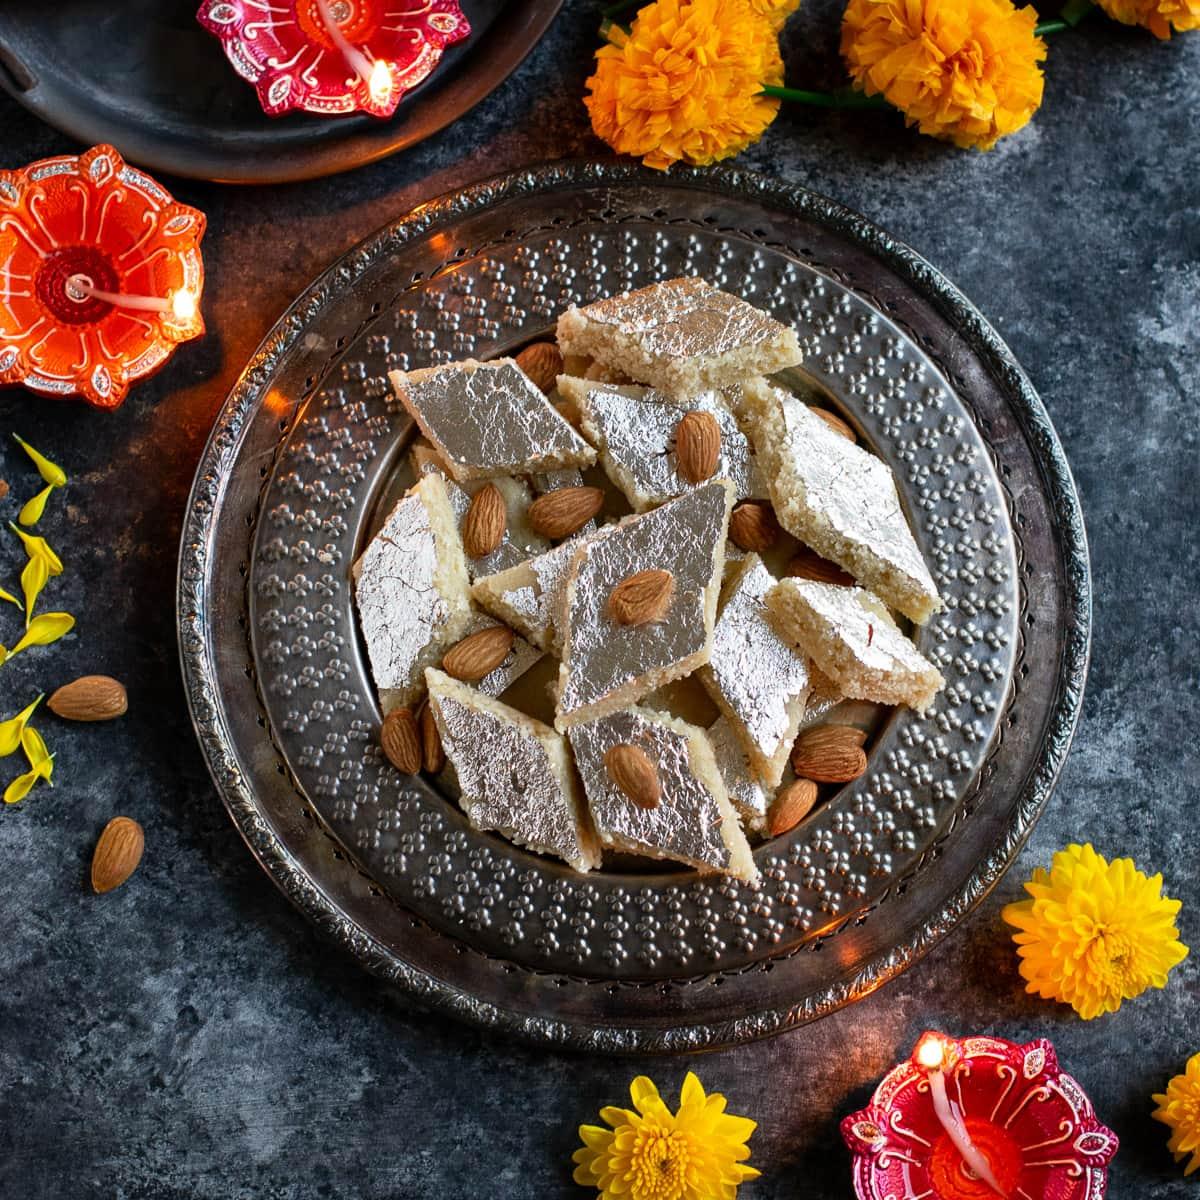 Almond barfi on a dish with marigold and diya on the side